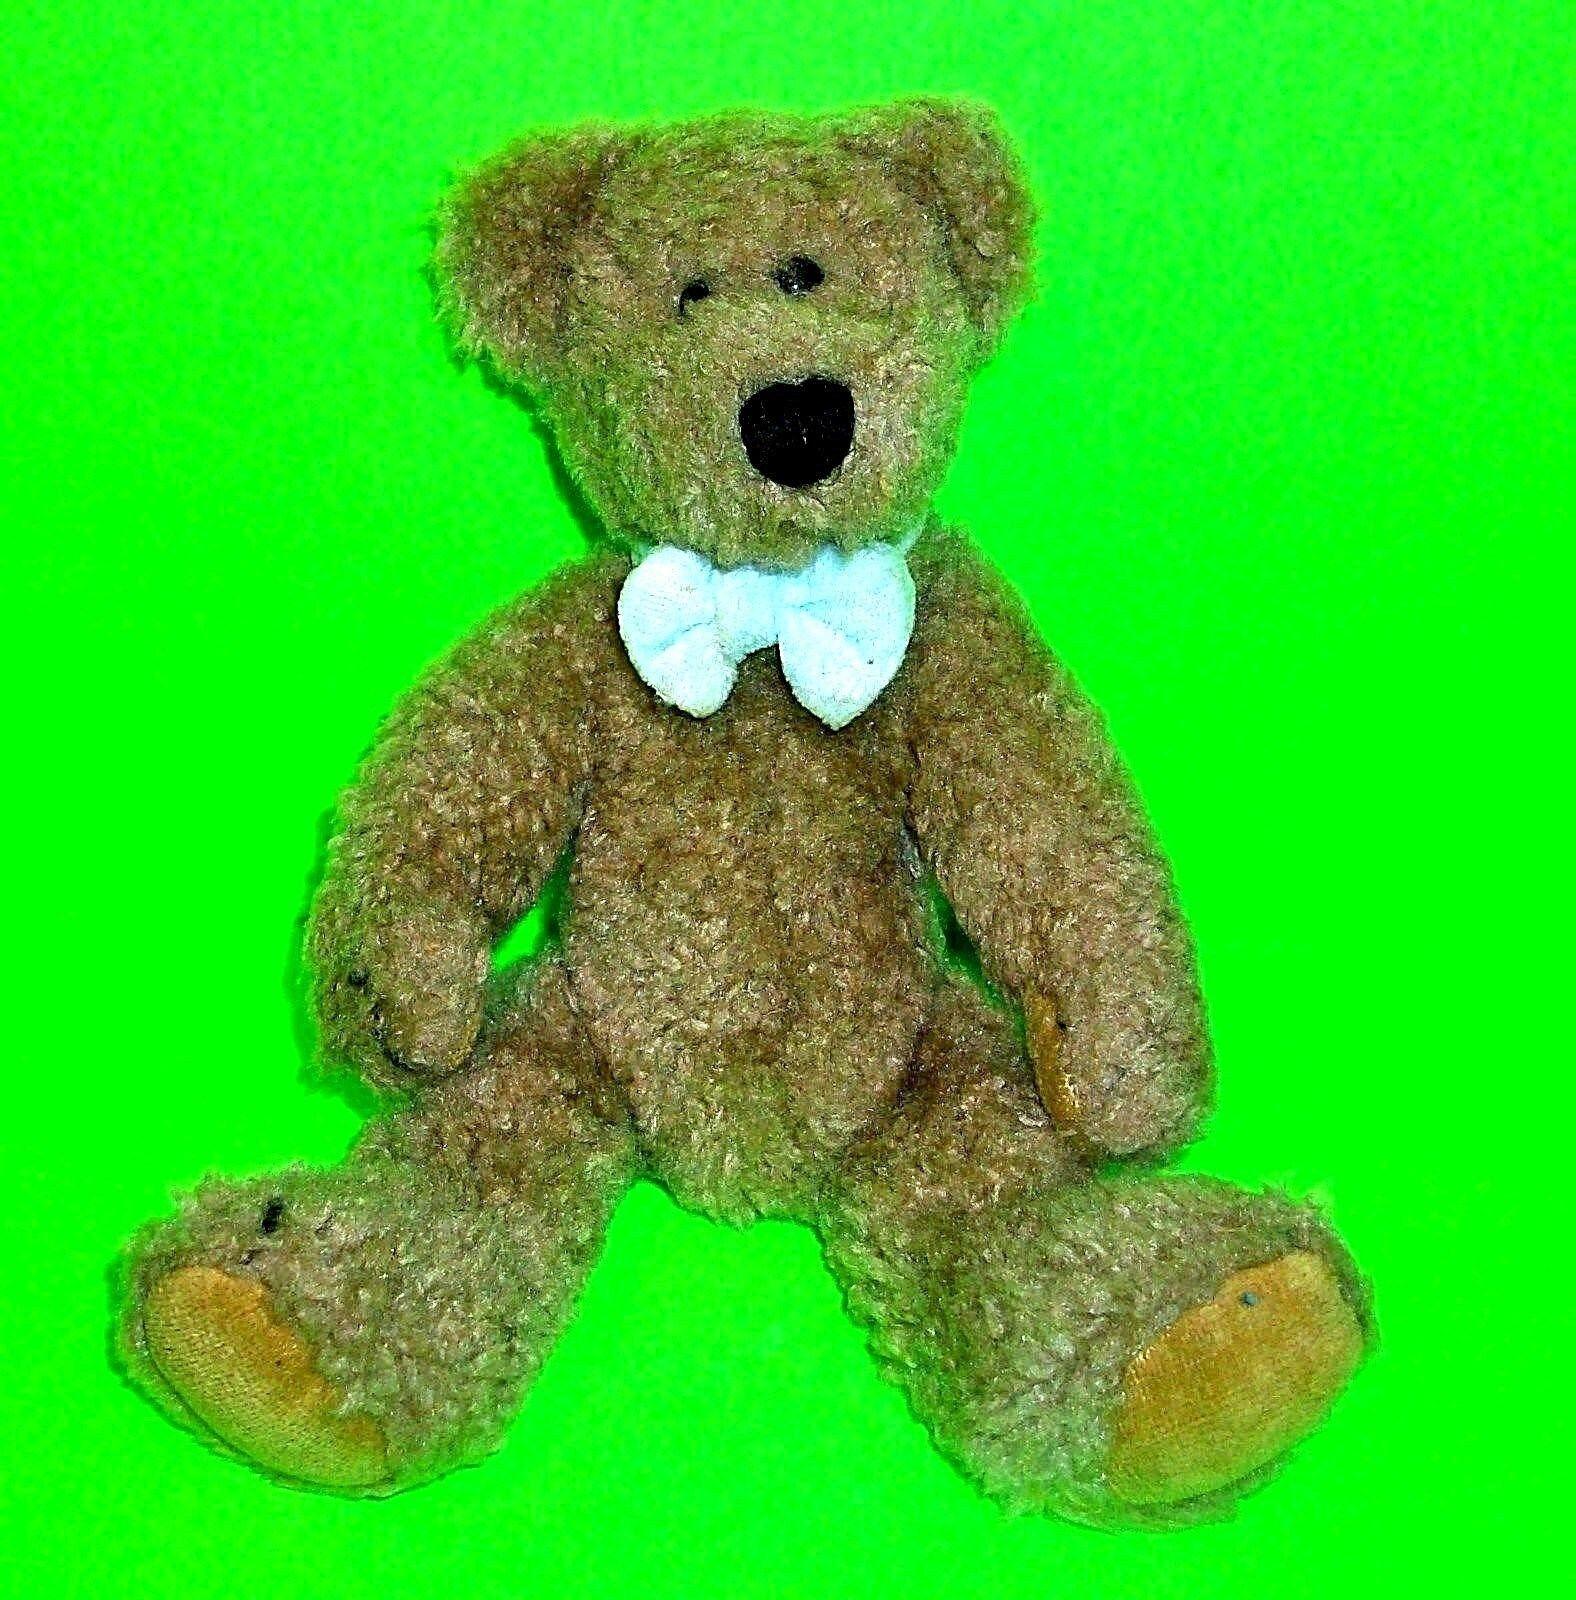 Boyds marrone Teddy Bear Plush Jointed bianca Bow Tie 9 Inch J.B. Bean Series 1996